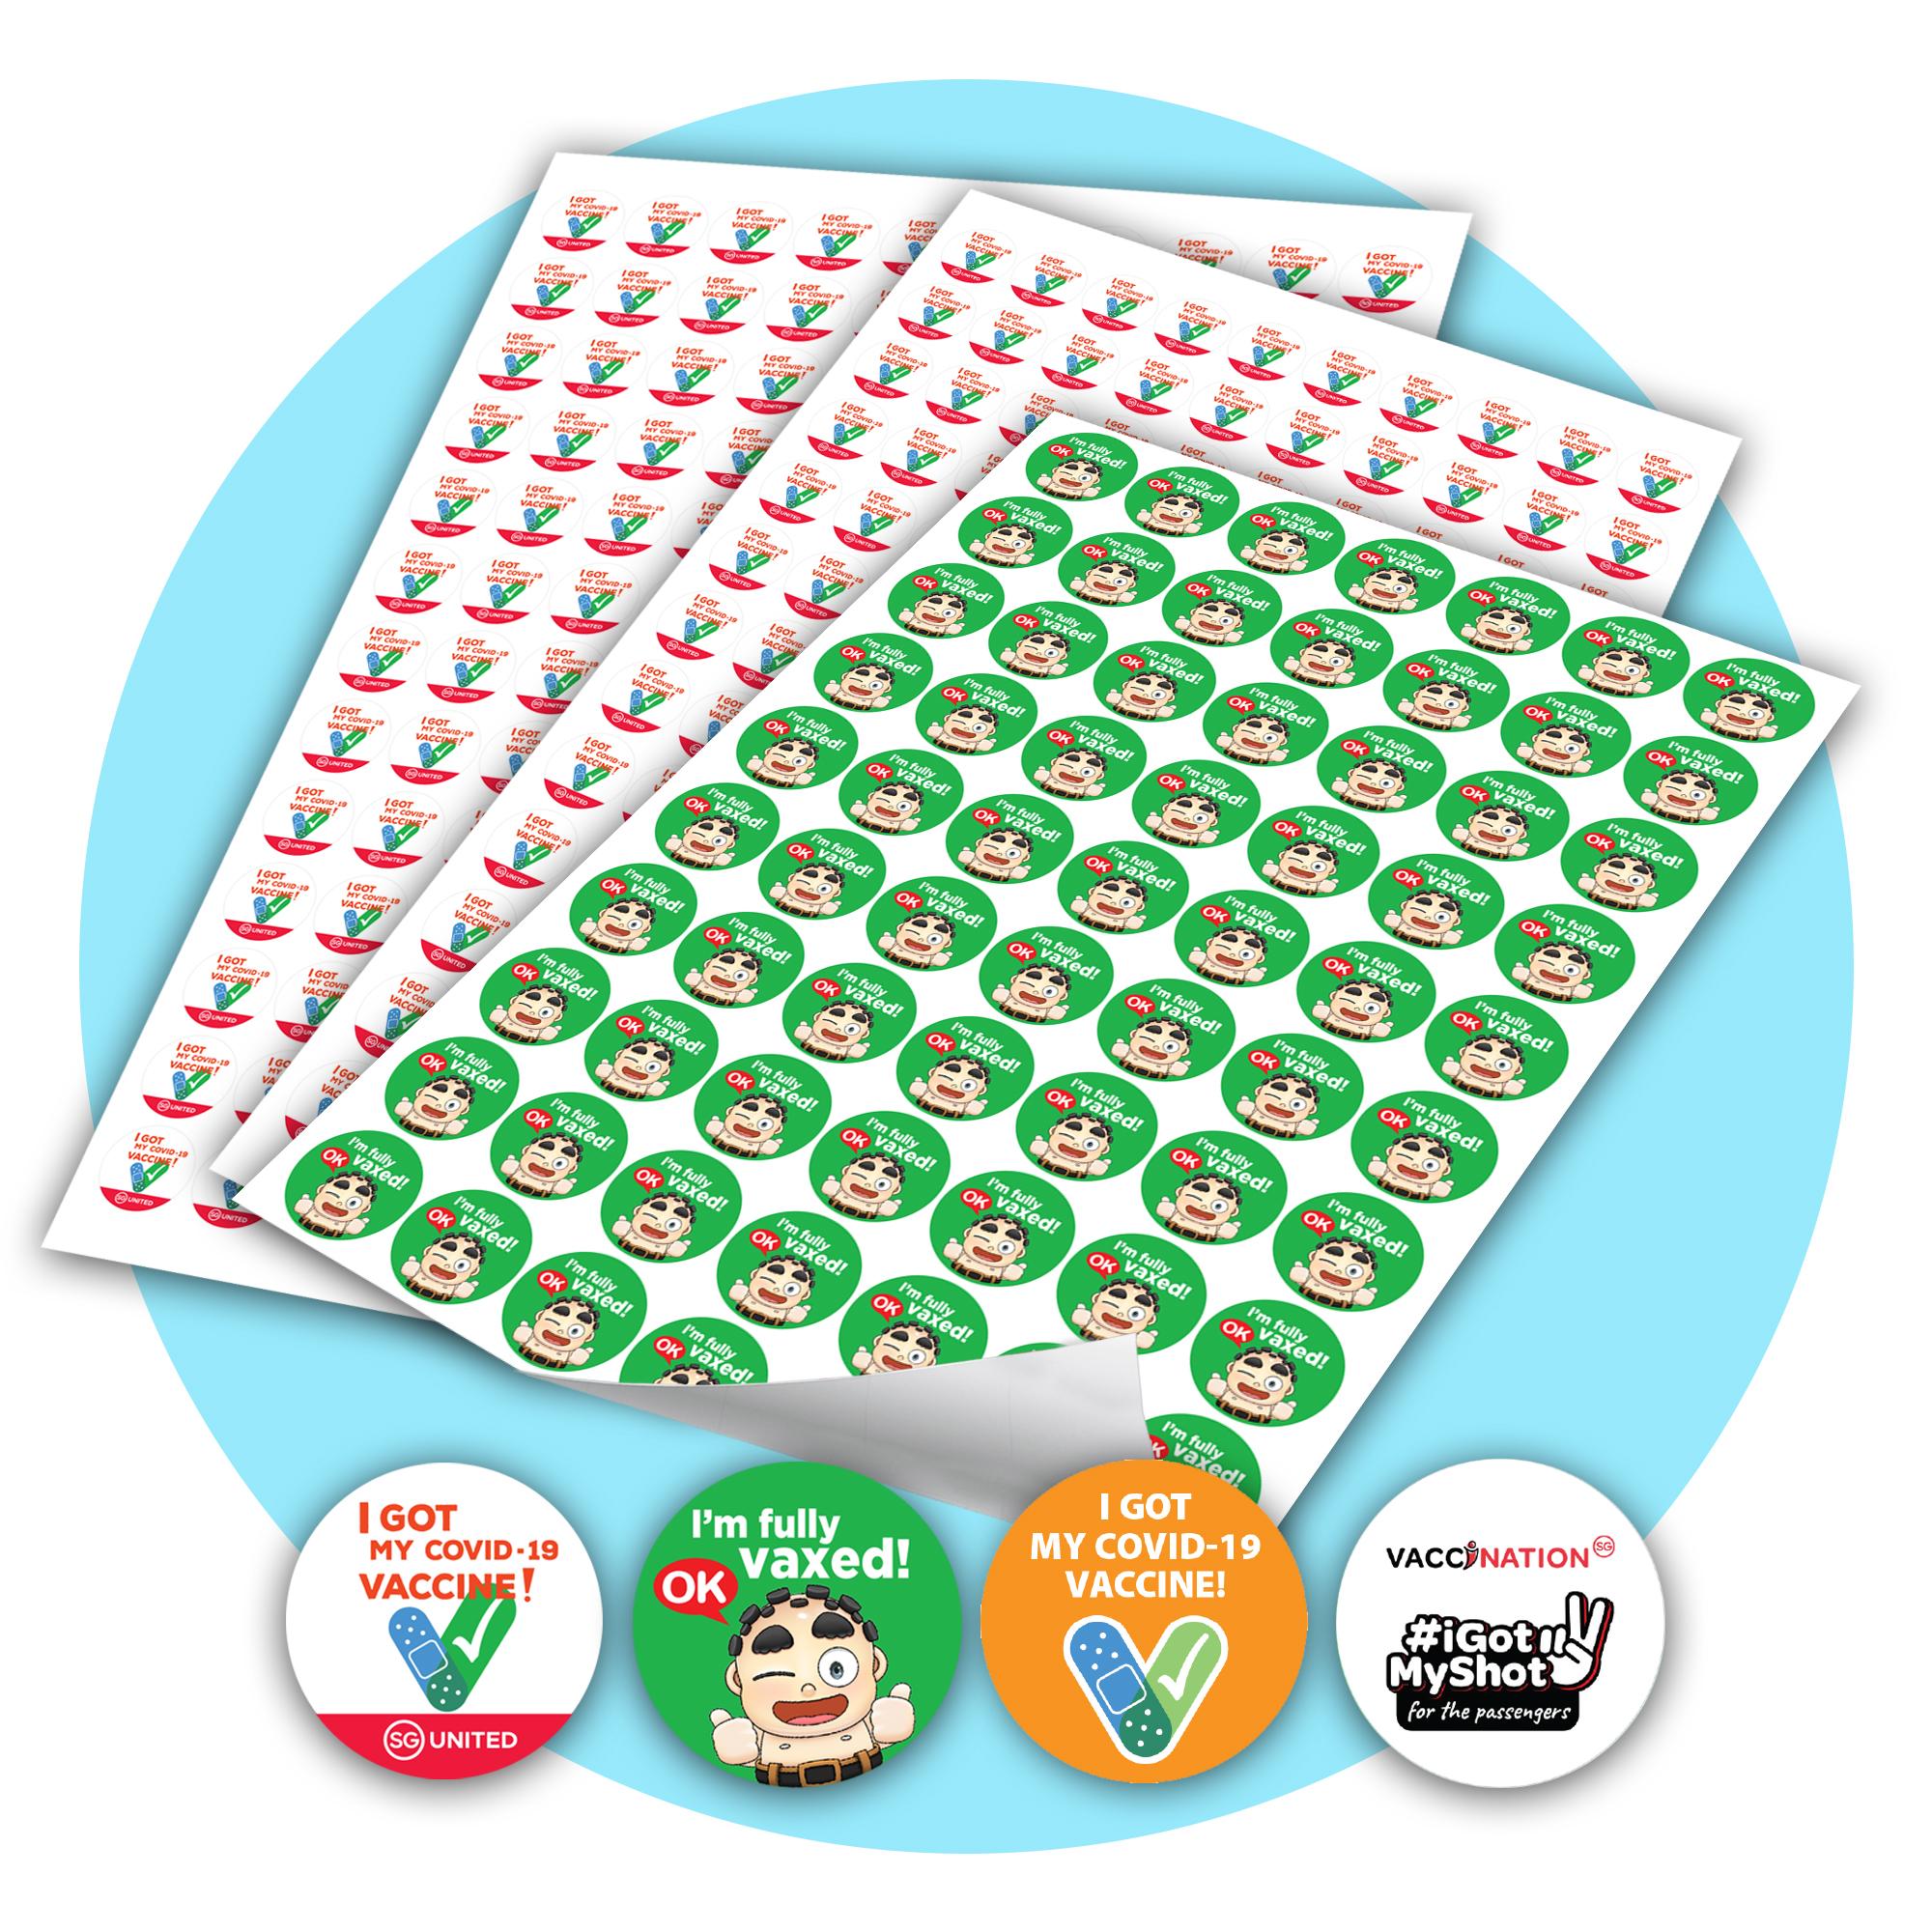 Vaccinated sticker (A3 size paper sticker)